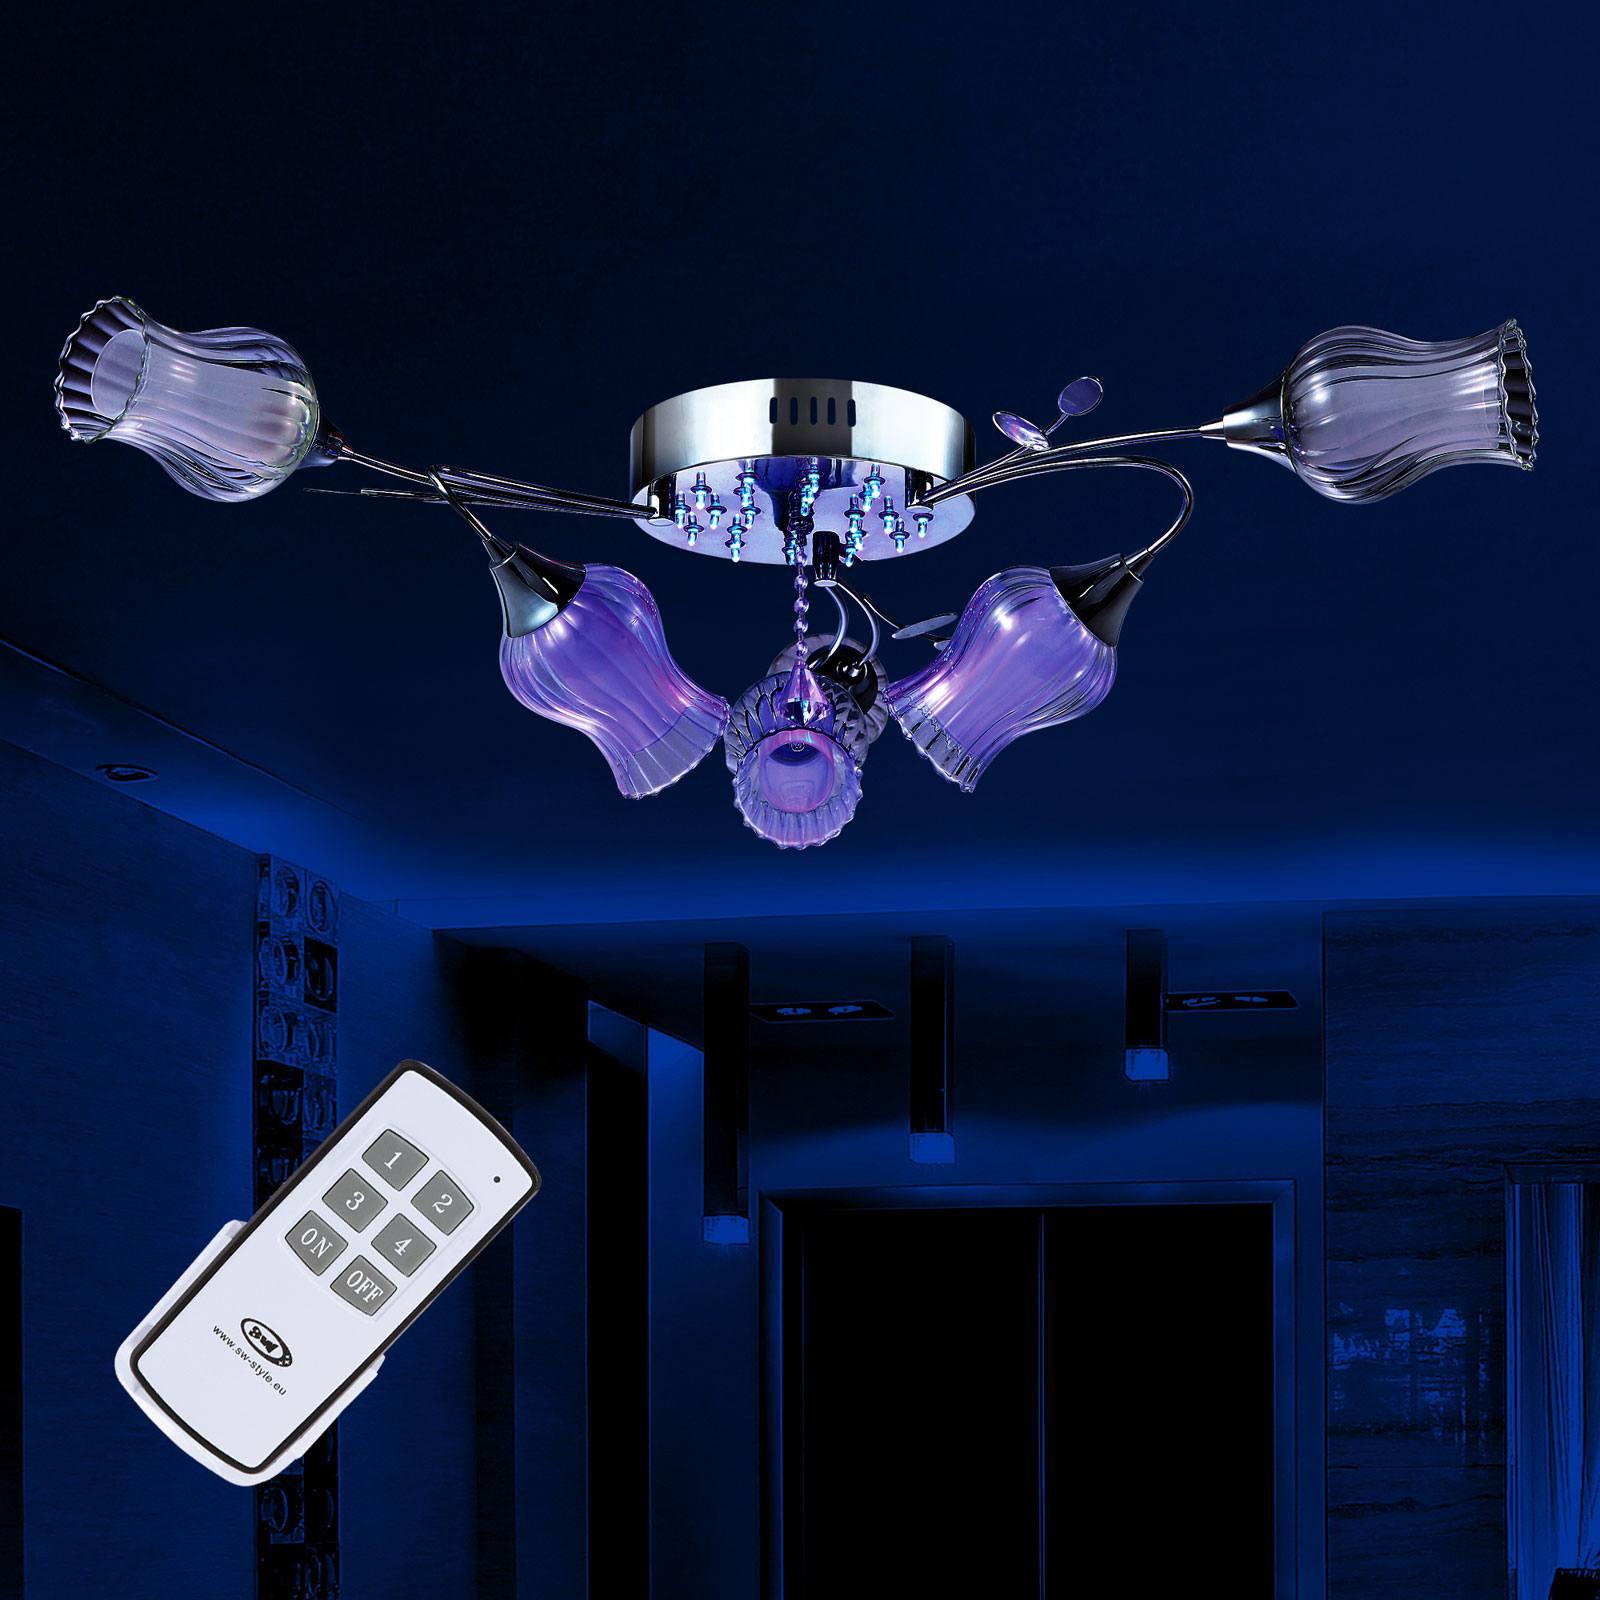 Full Size of Led Wohnzimmer Lampe Ebay Ledersofa Spots Wieviel Watt Beleuchtung Planen Deckenleuchte 6 Flammig Farbwechsel Deckenlampe Teppiche Küche Deckenlampen Modern Wohnzimmer Wohnzimmer Led